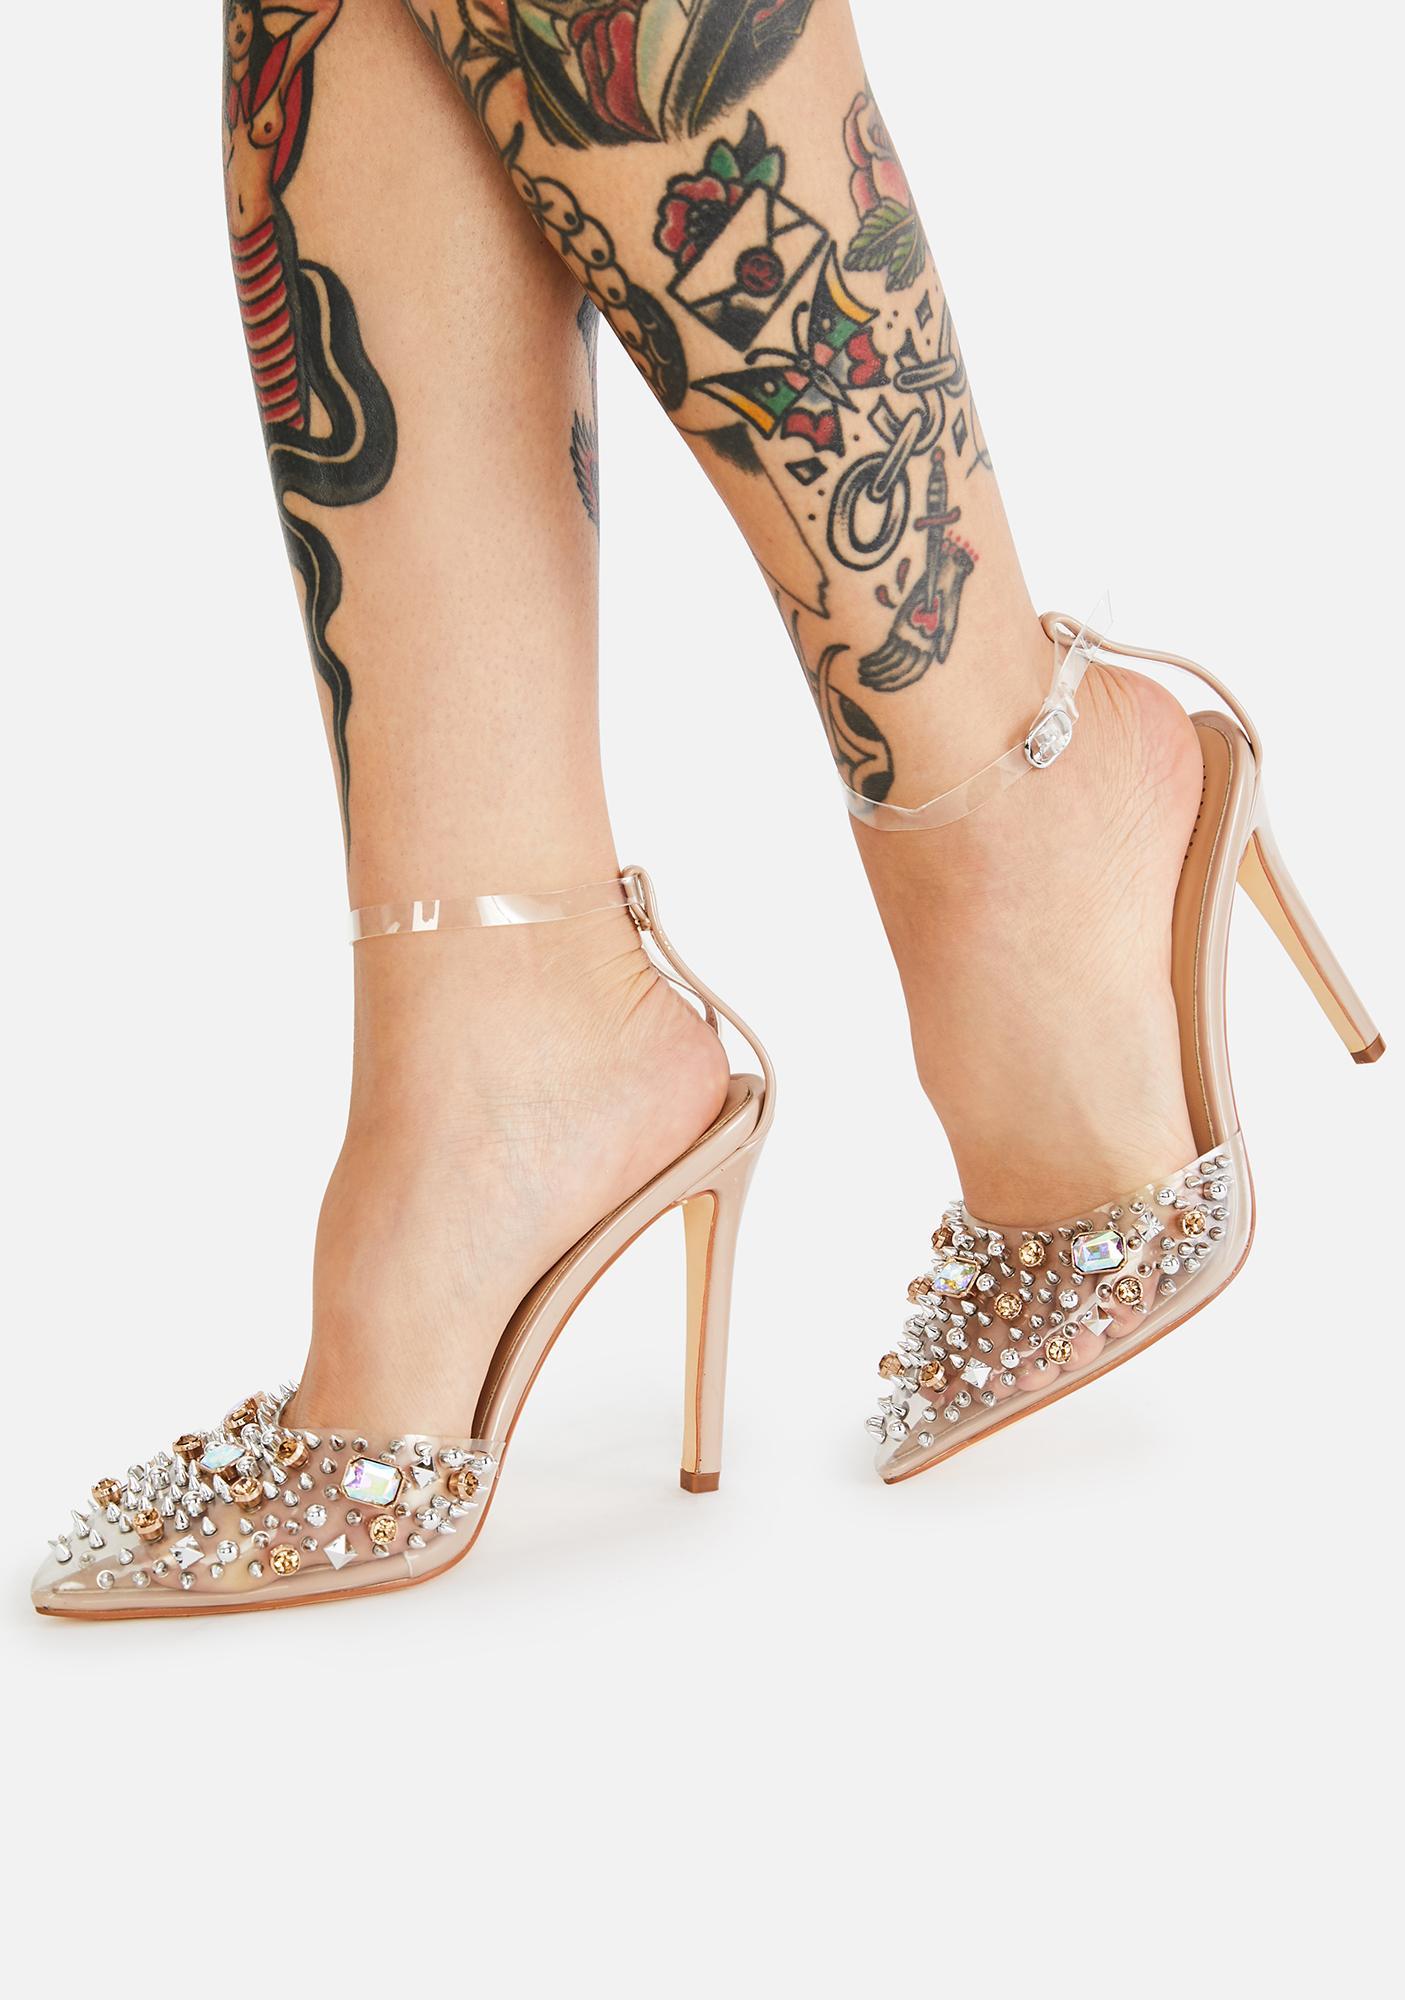 AZALEA WANG Nude Popstar Jeweled Heels